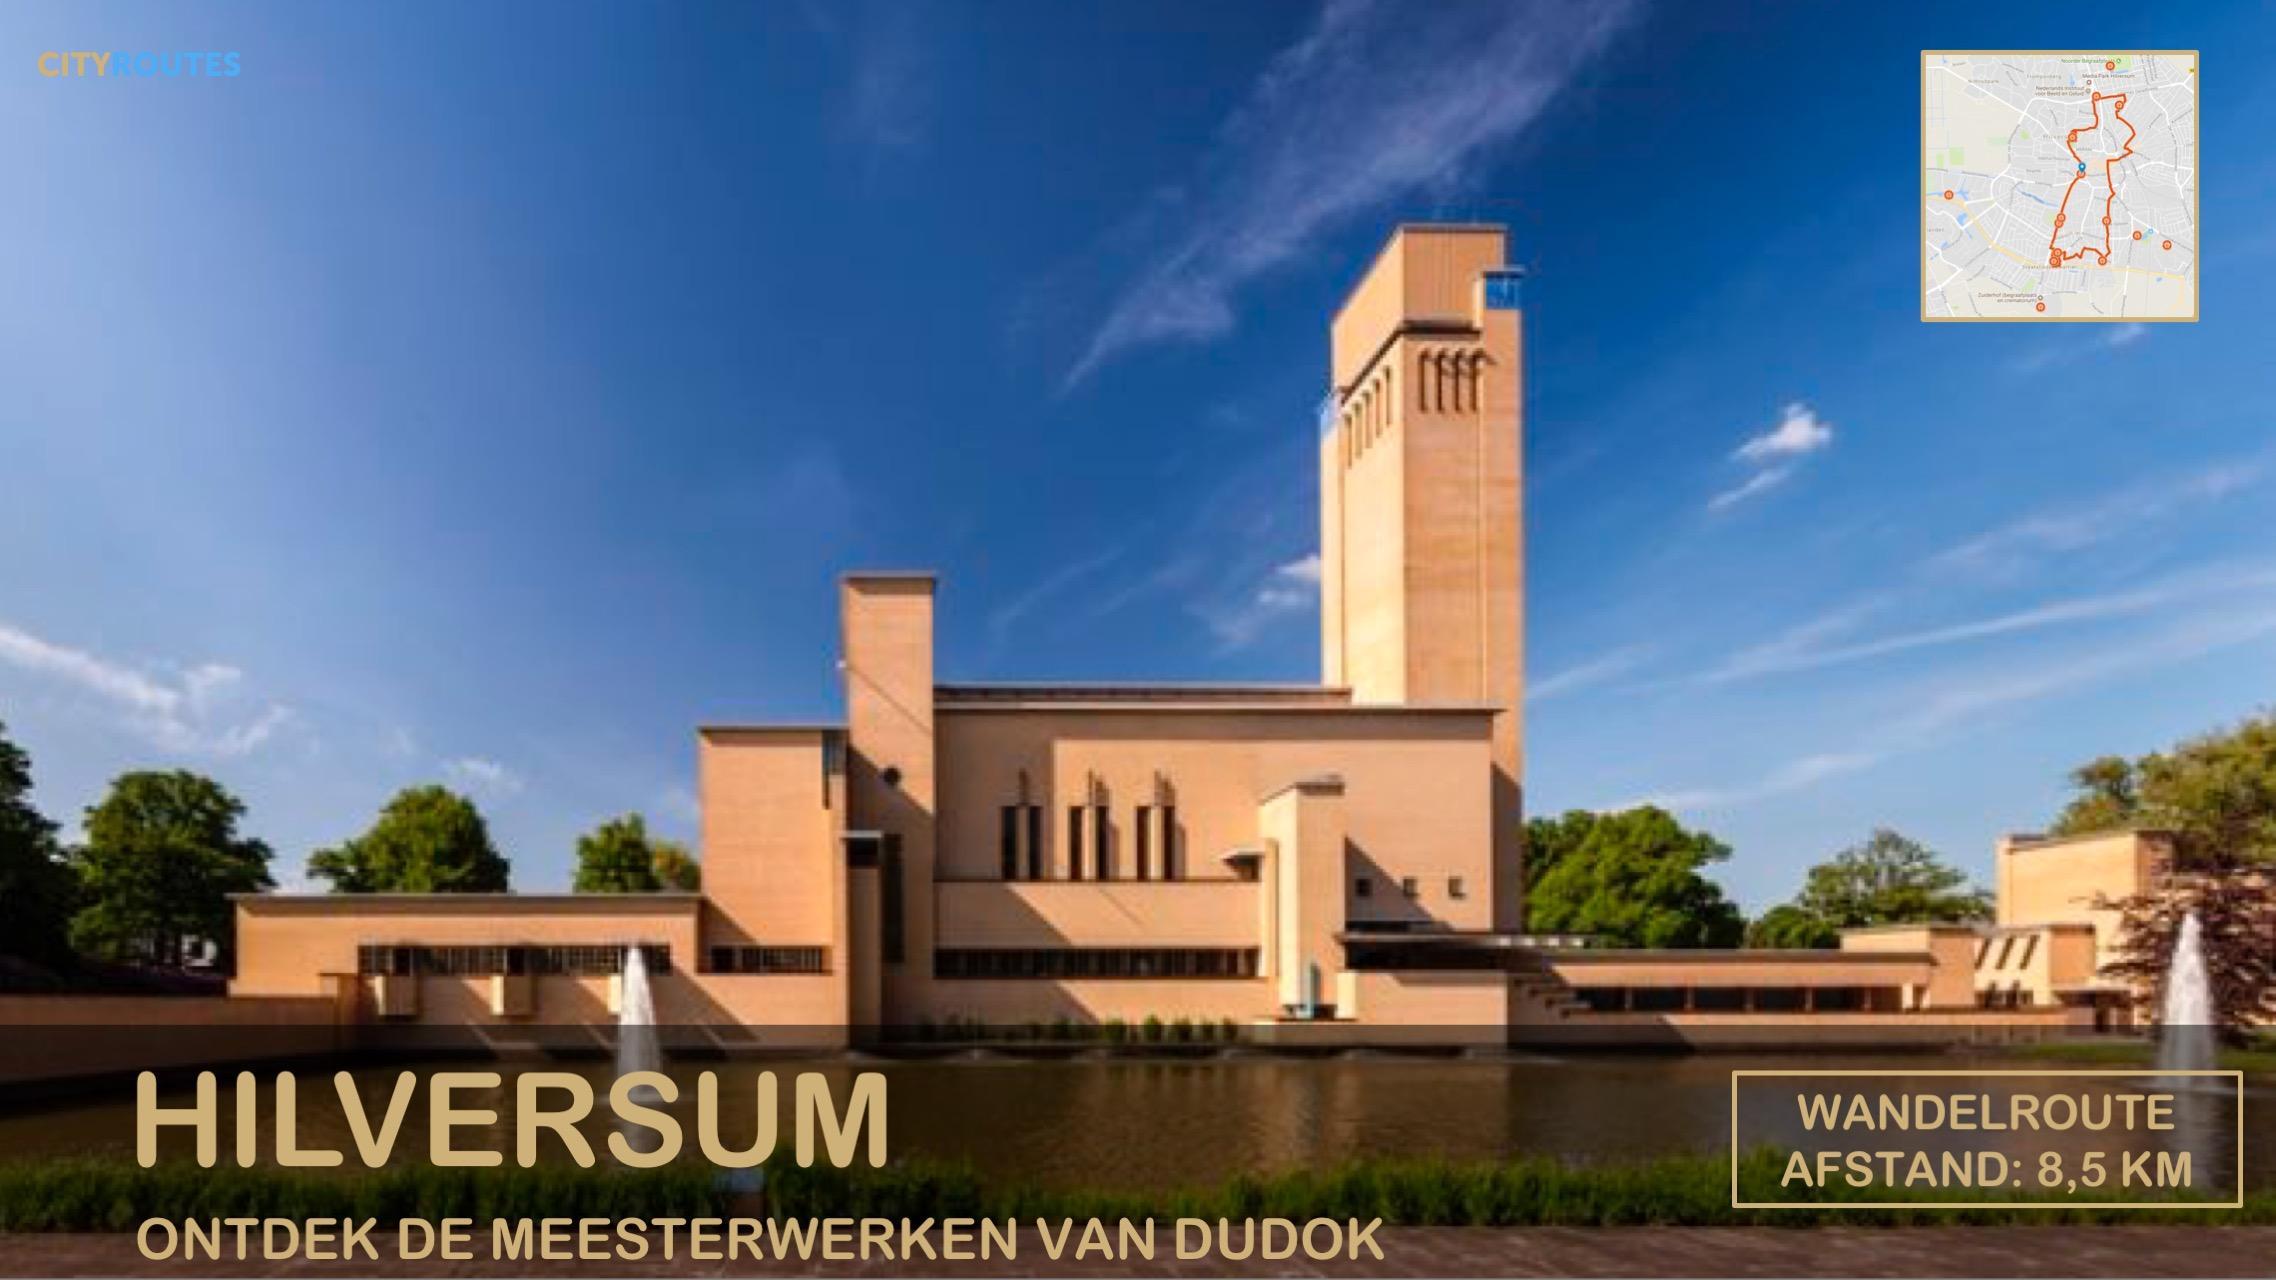 Gratis stadswandeling Hilversum Cityroutes